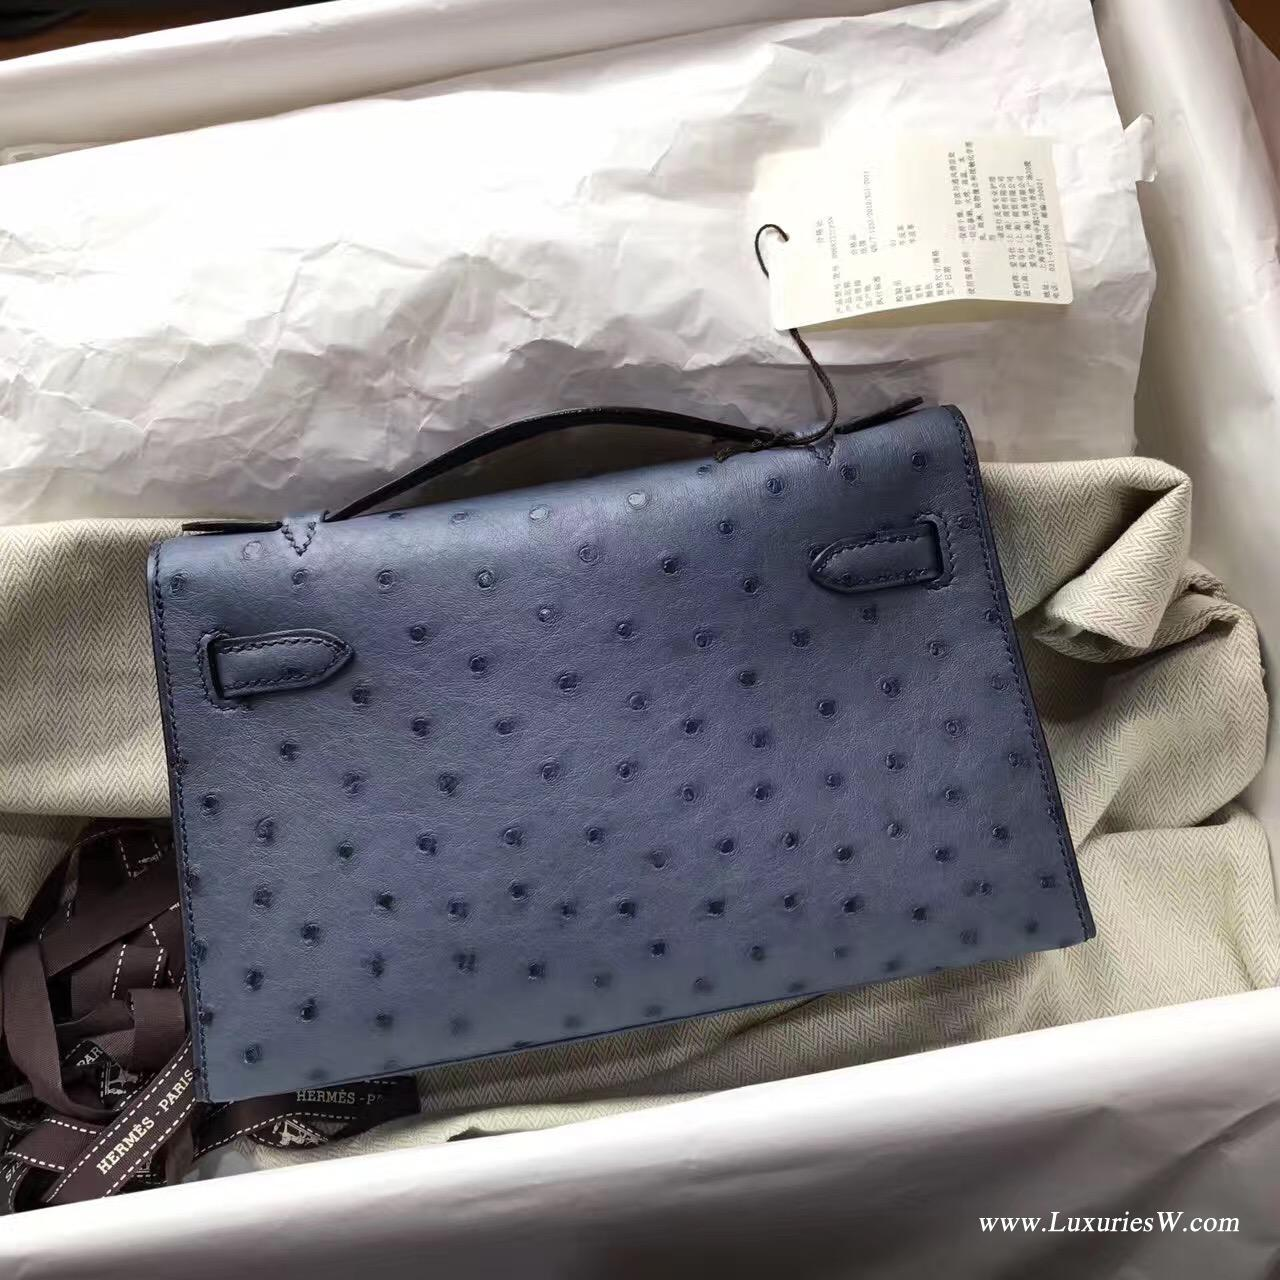 Hermes凯莉包Mini kelly宴会手包ck73 Blue Saphir宝石蓝 气质蓝色